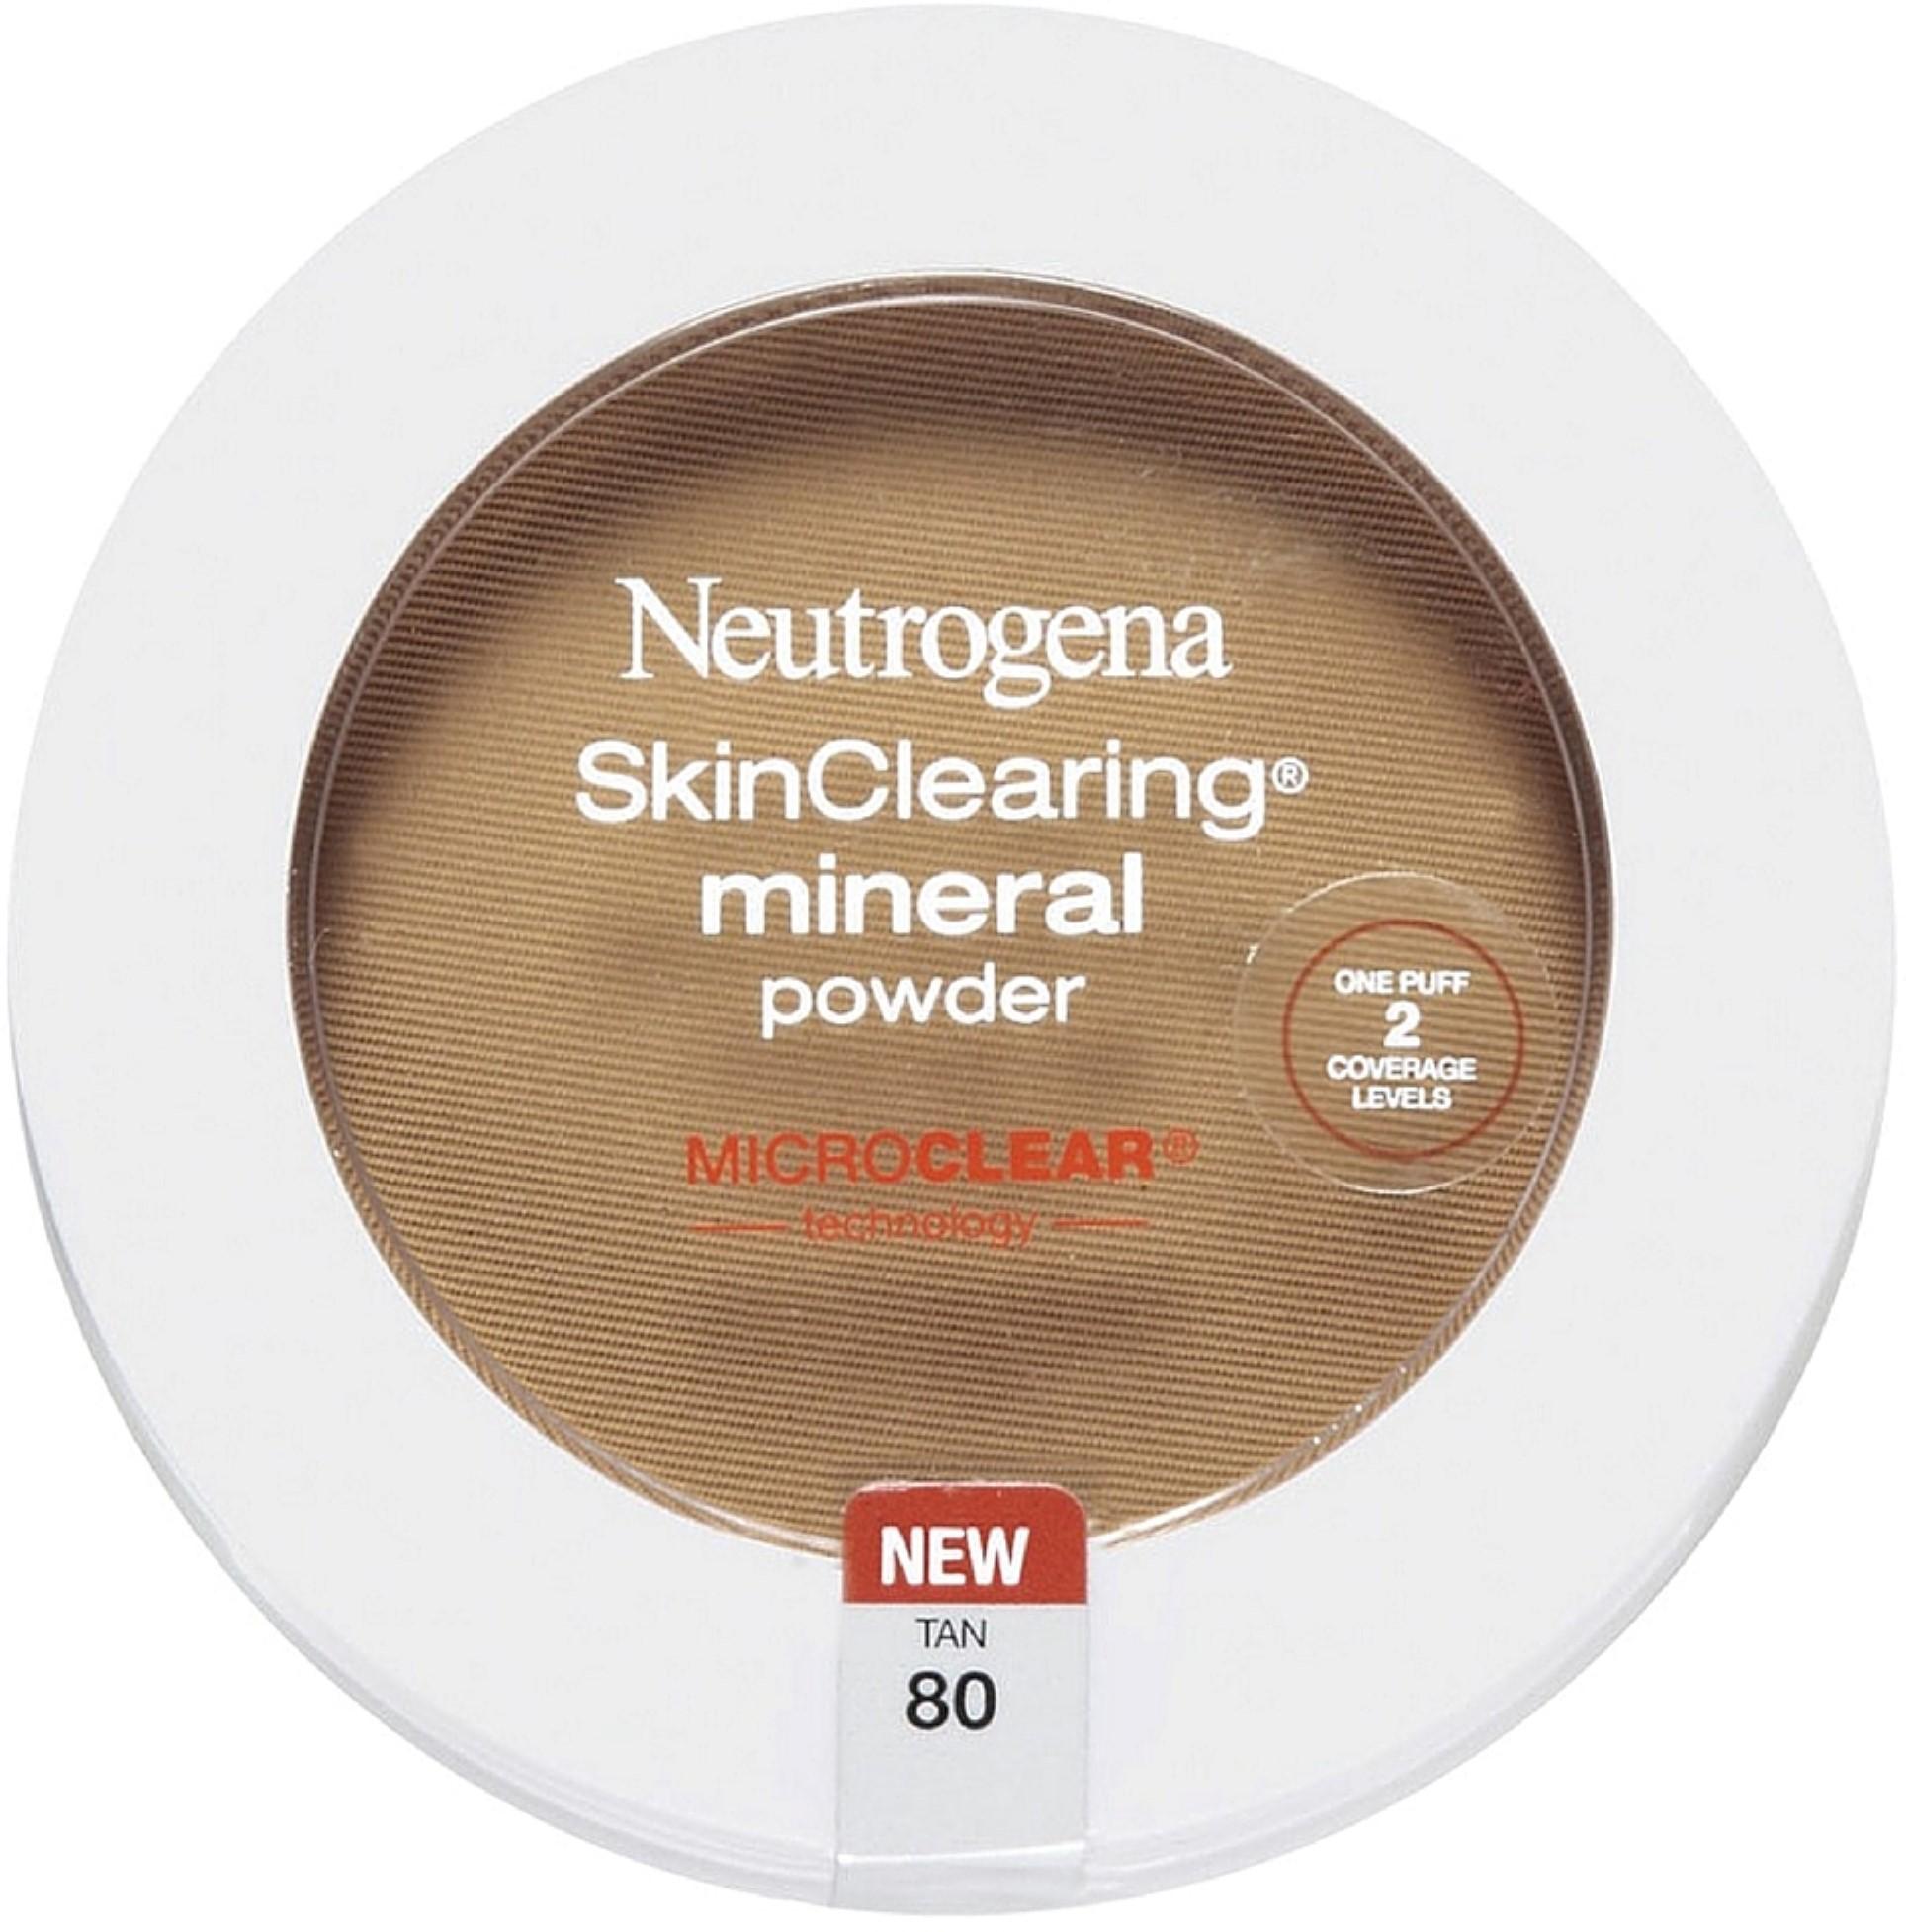 Neutrogena Skin Clearing Mineral Powder, Tan [80] 0.34 oz (Pack of 6)